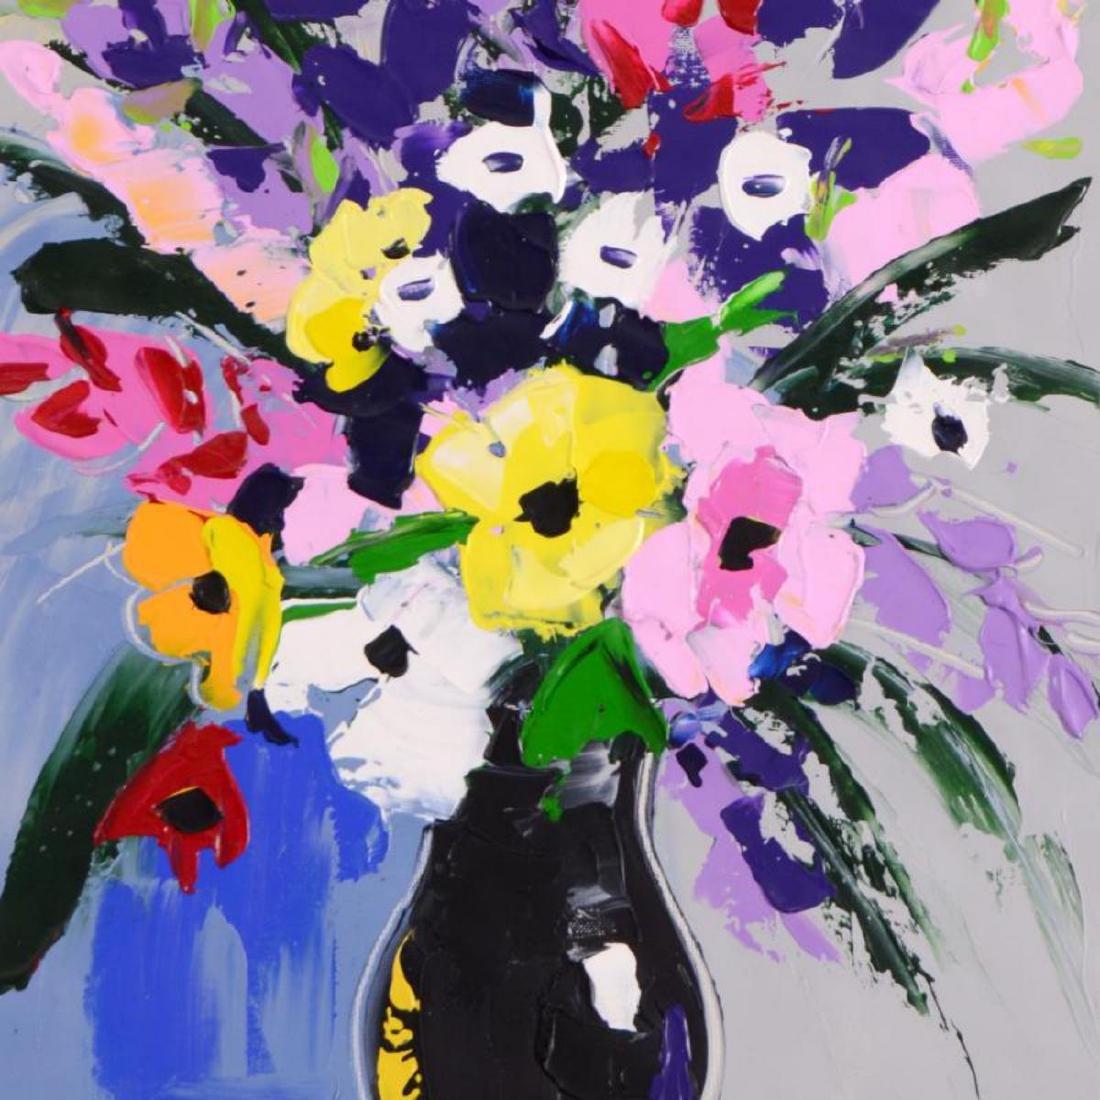 Lena Tants - Original Acrylic Painting on Canvas, Hand - 2